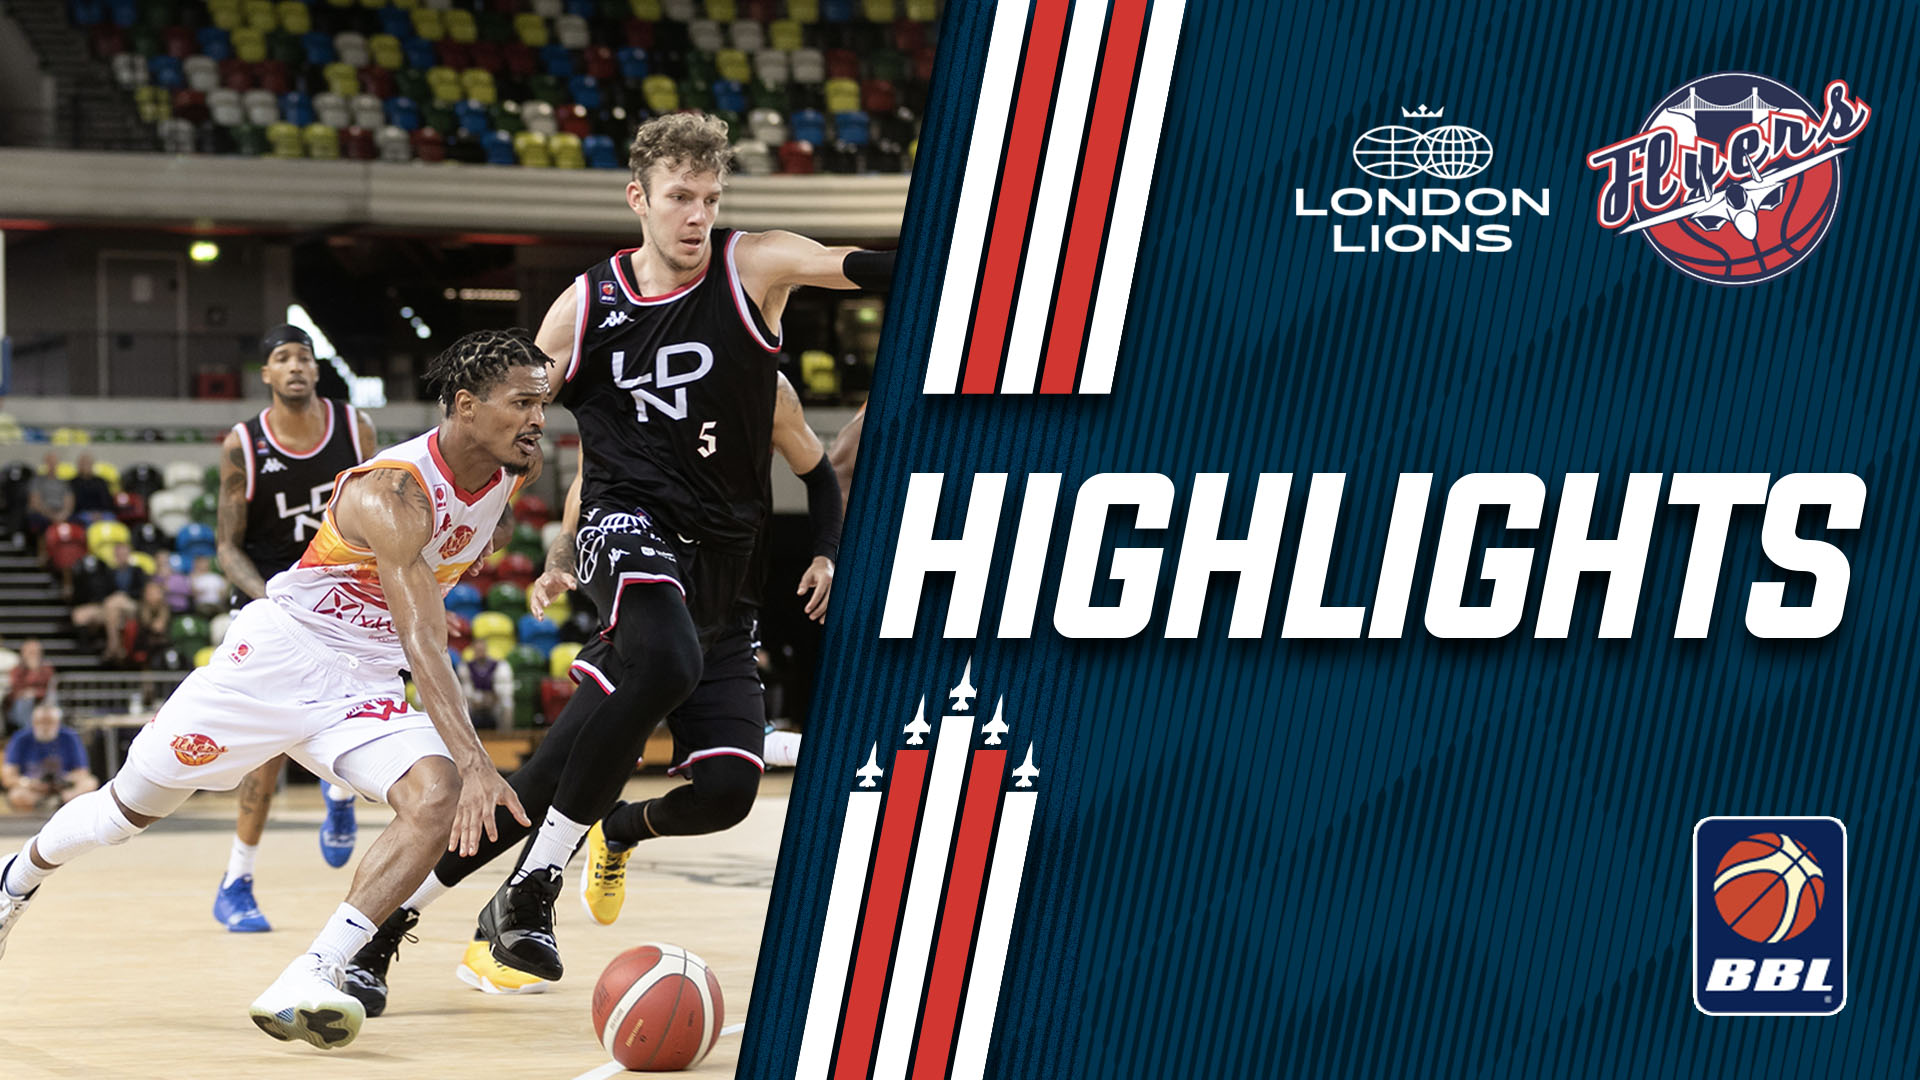 Highlights: London Lions 94-85 Bristol Flyers